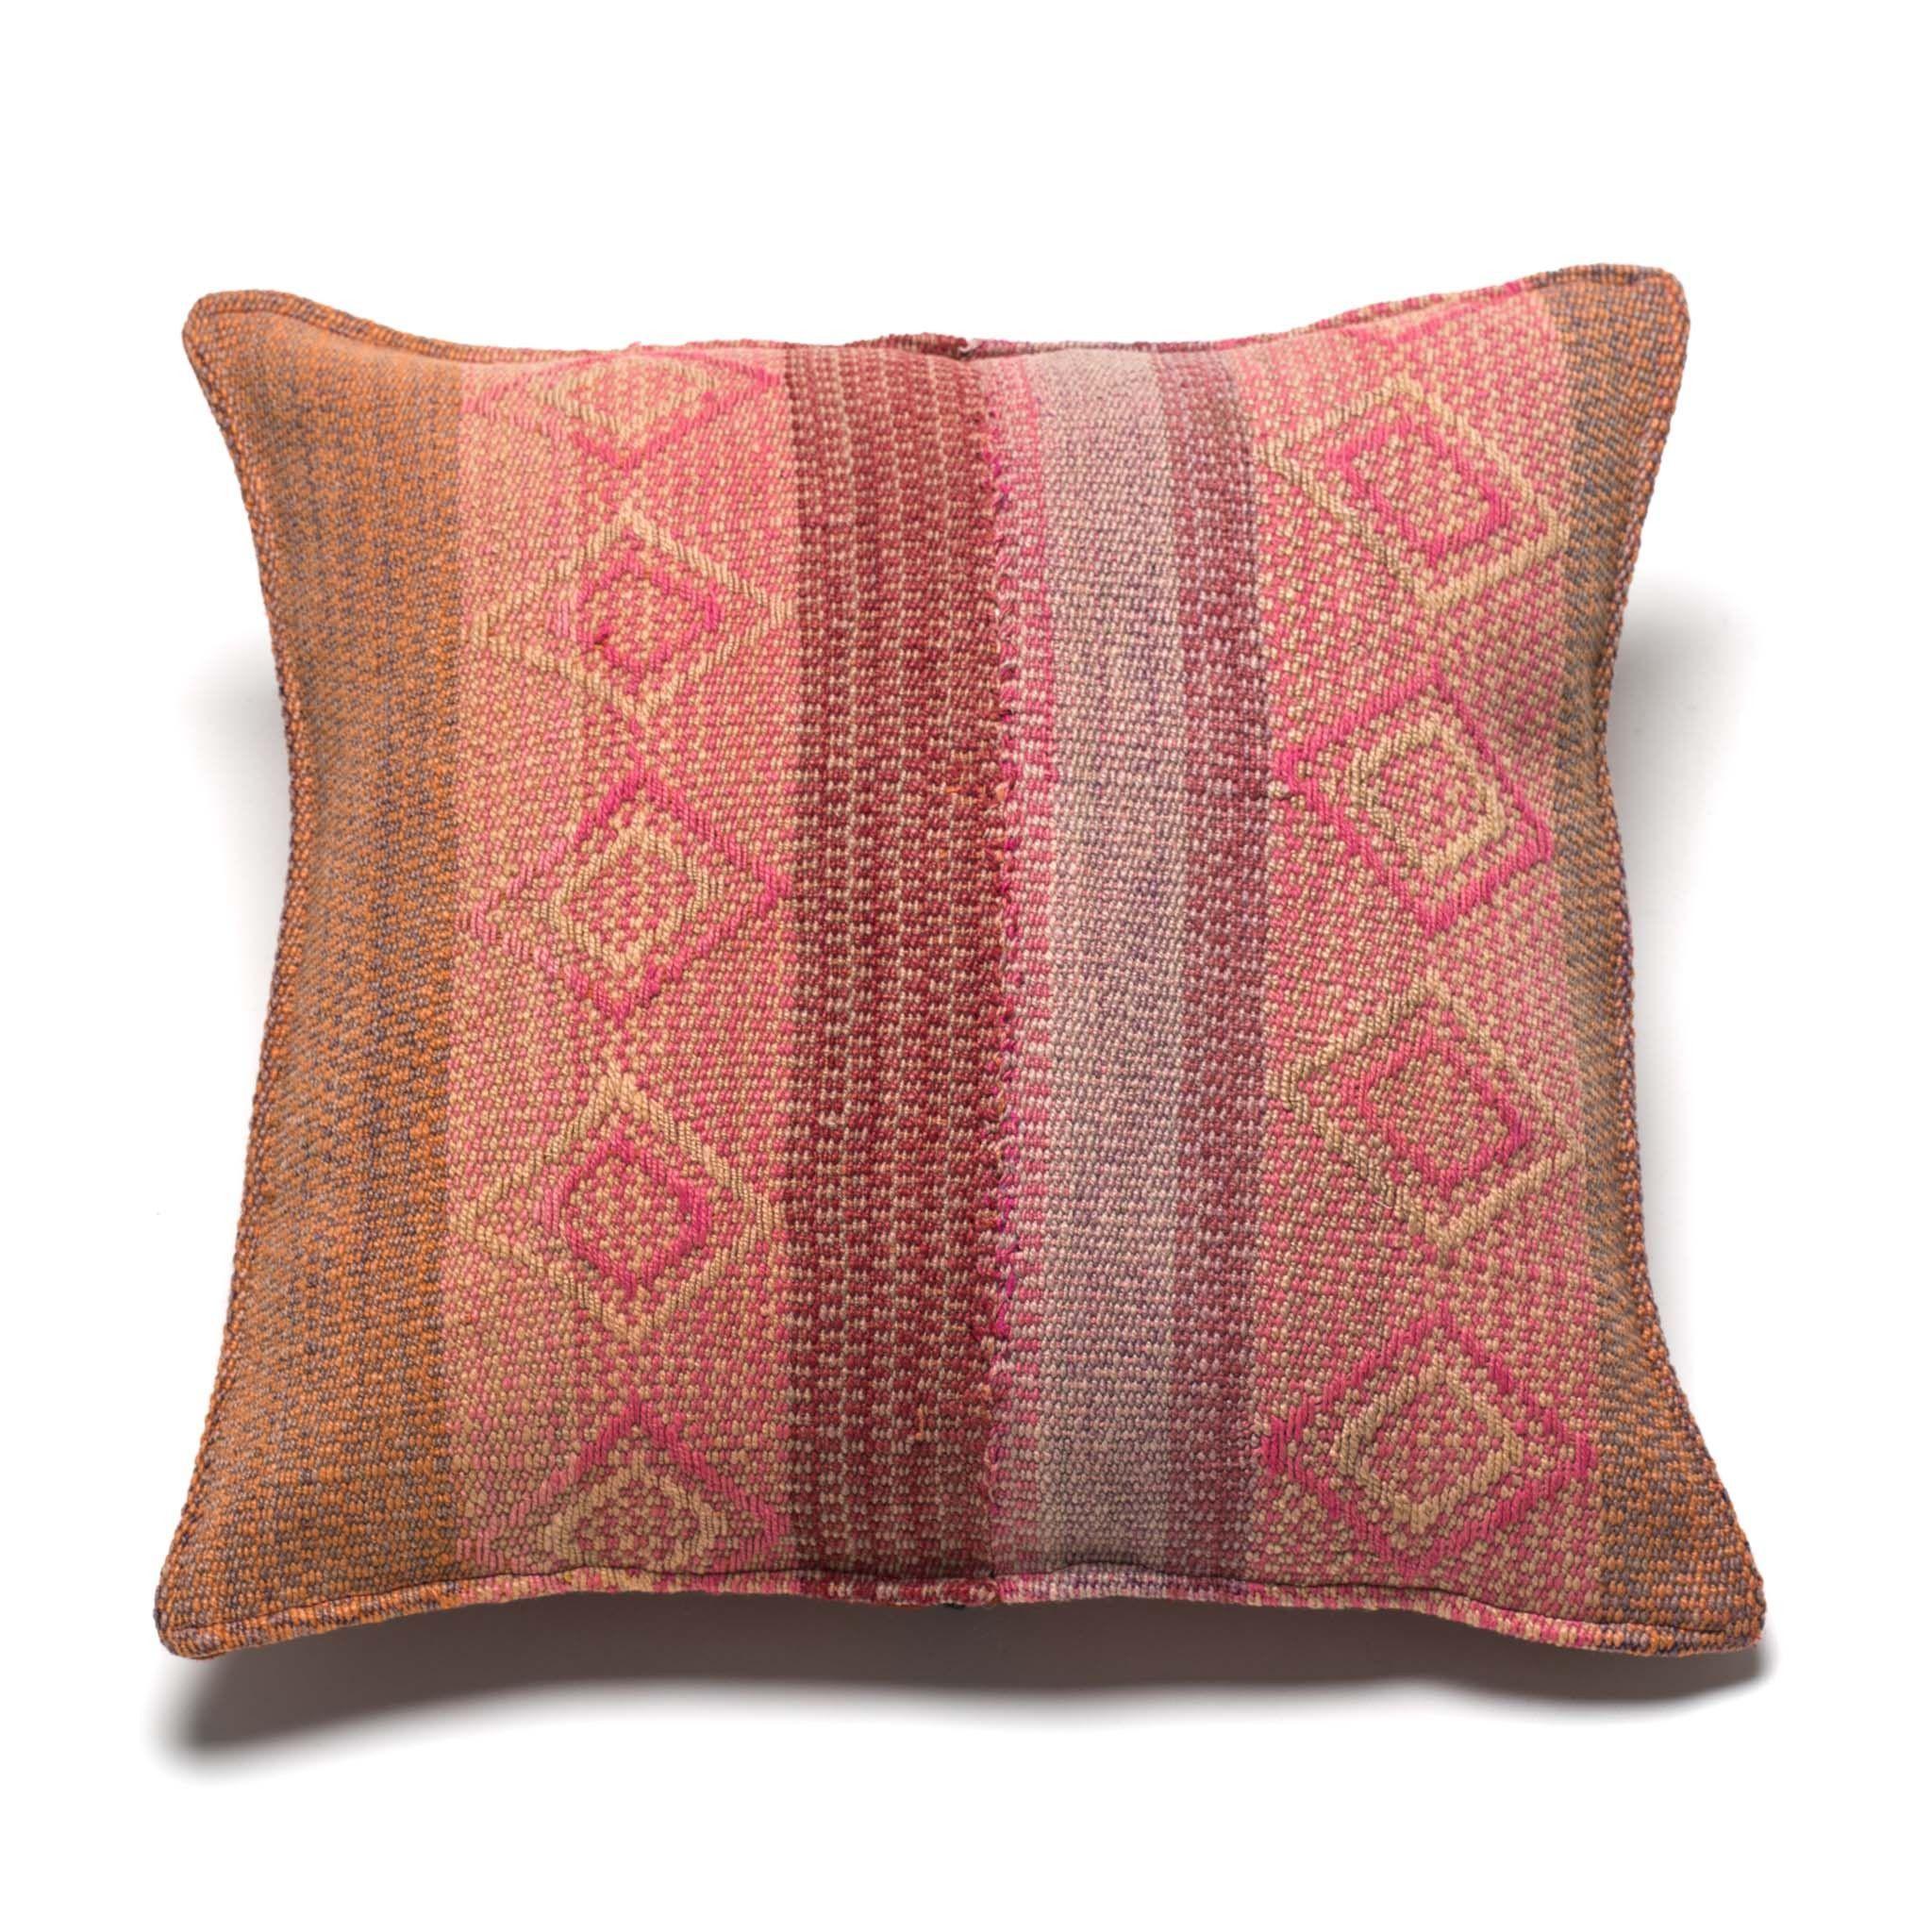 Woven pillow trece intiearth pillows pinterest pillows and